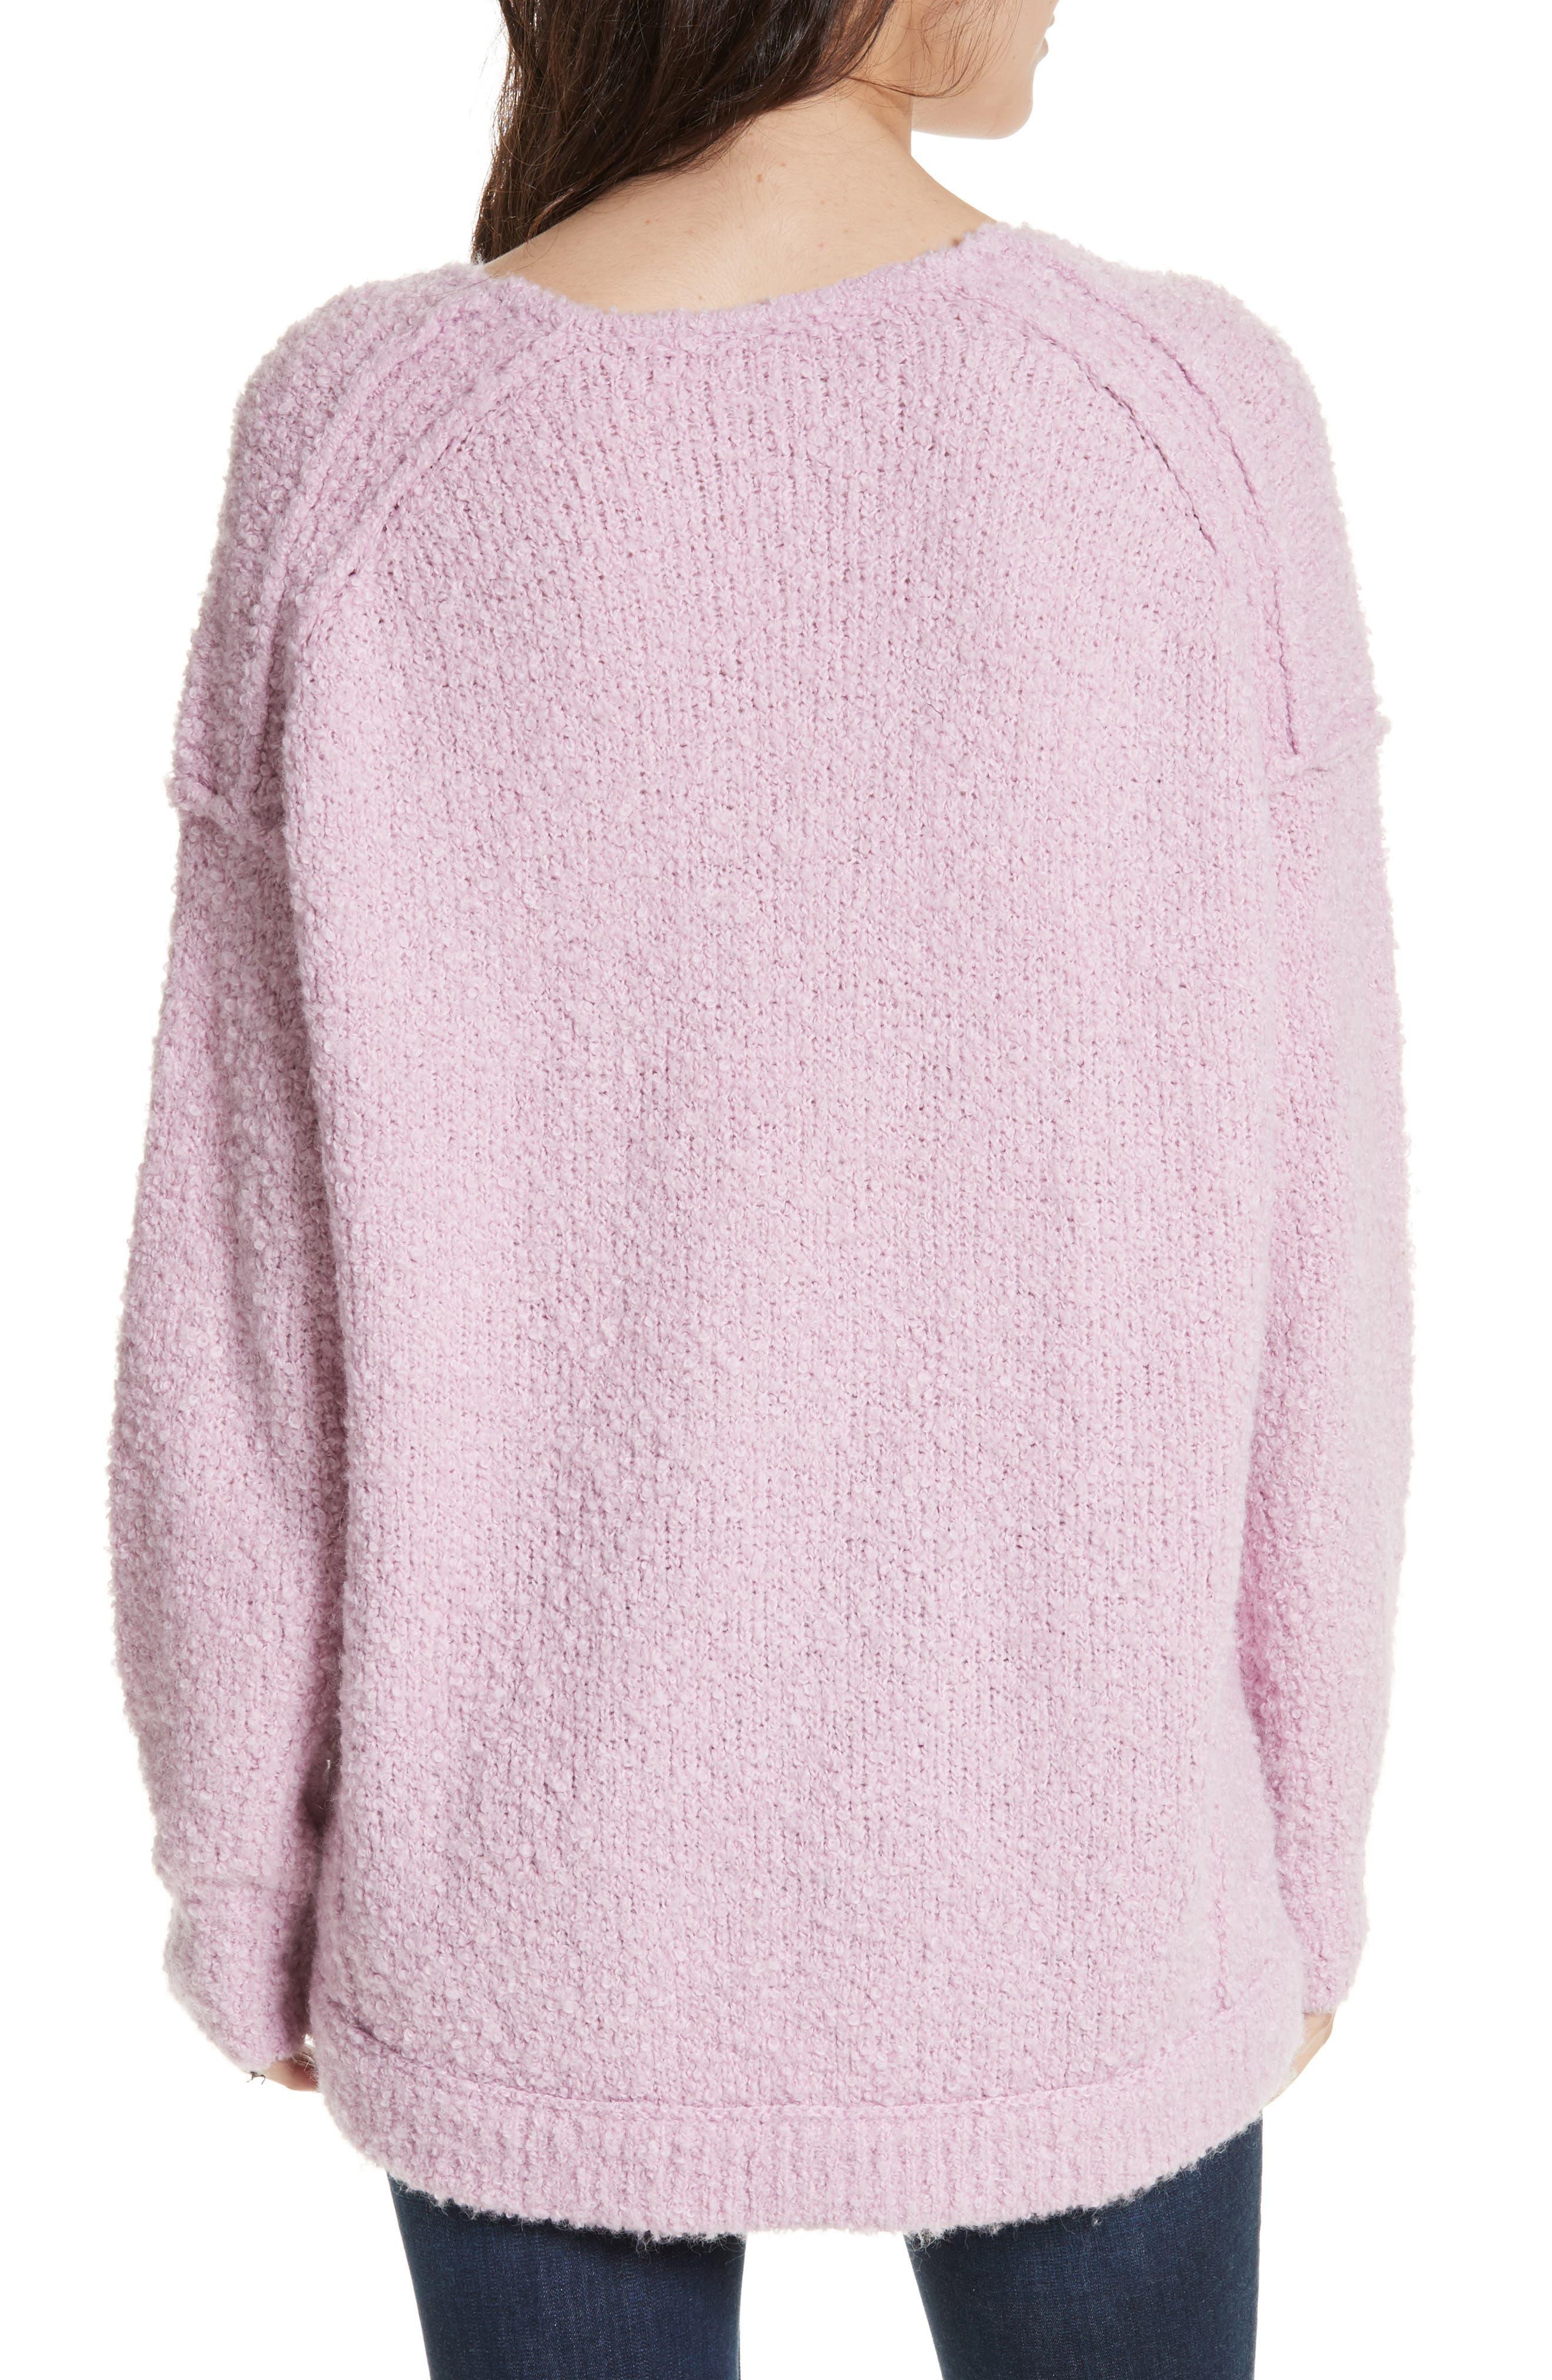 Lofty V-Neck Sweater,                             Alternate thumbnail 11, color,